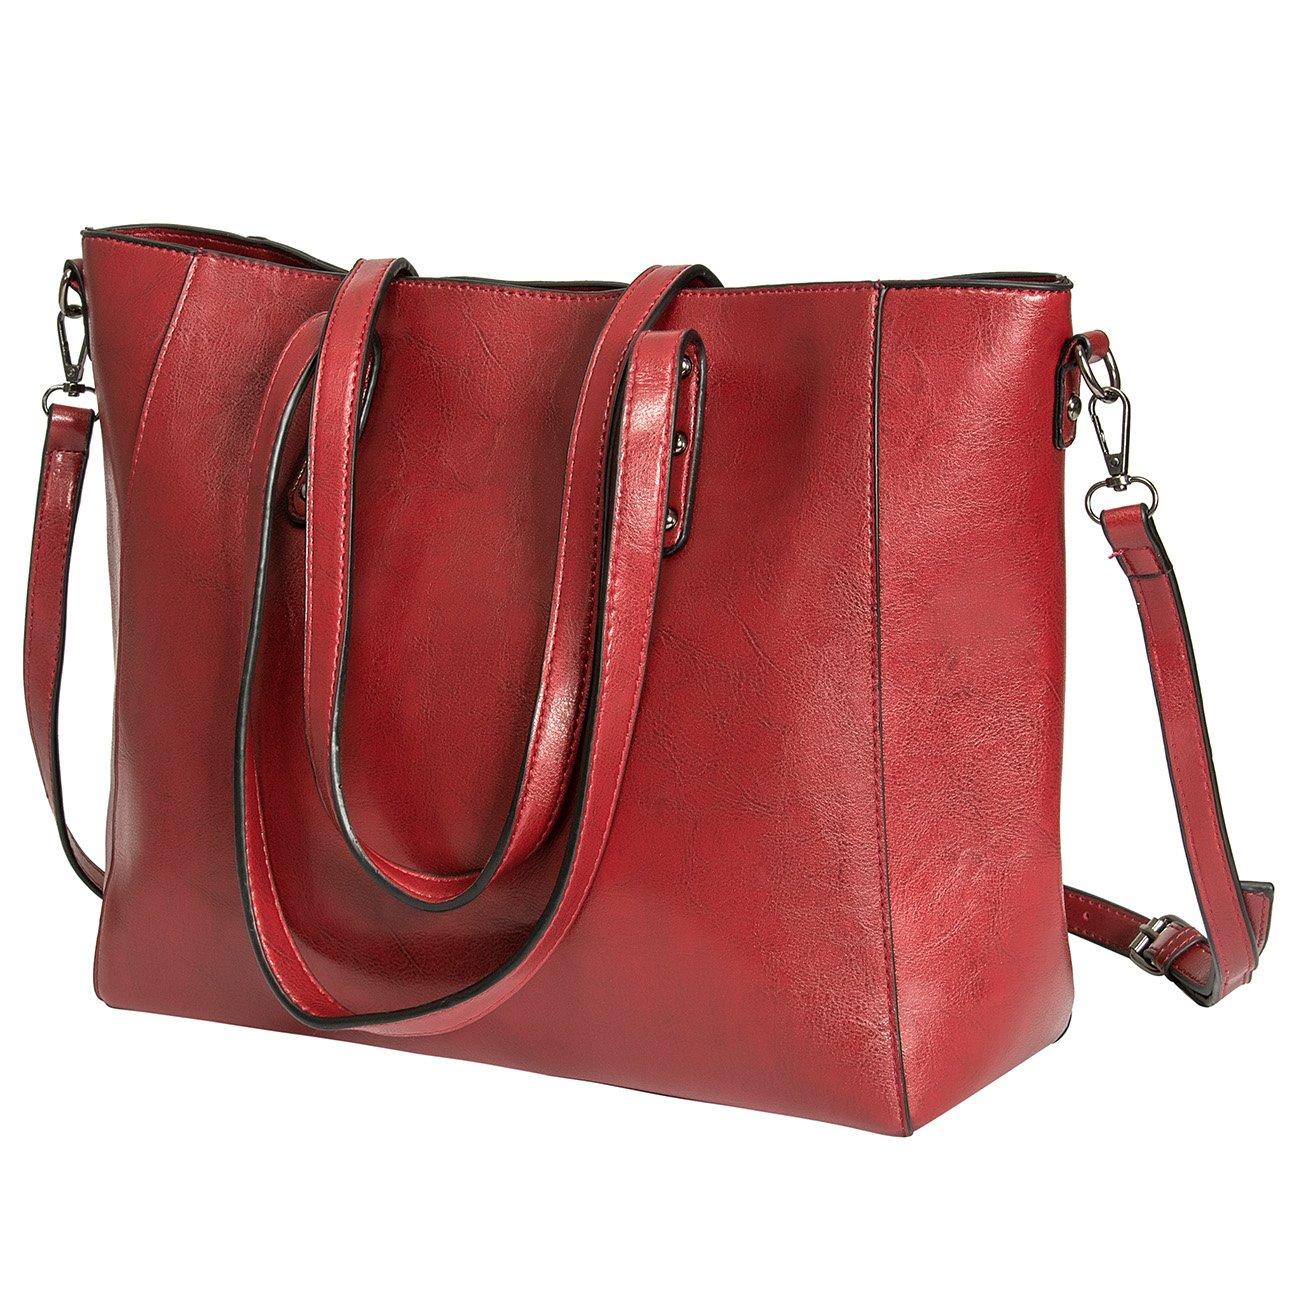 Women Top Handle Satchel Handbags Shoulder Bags Tote Purse (wine red)